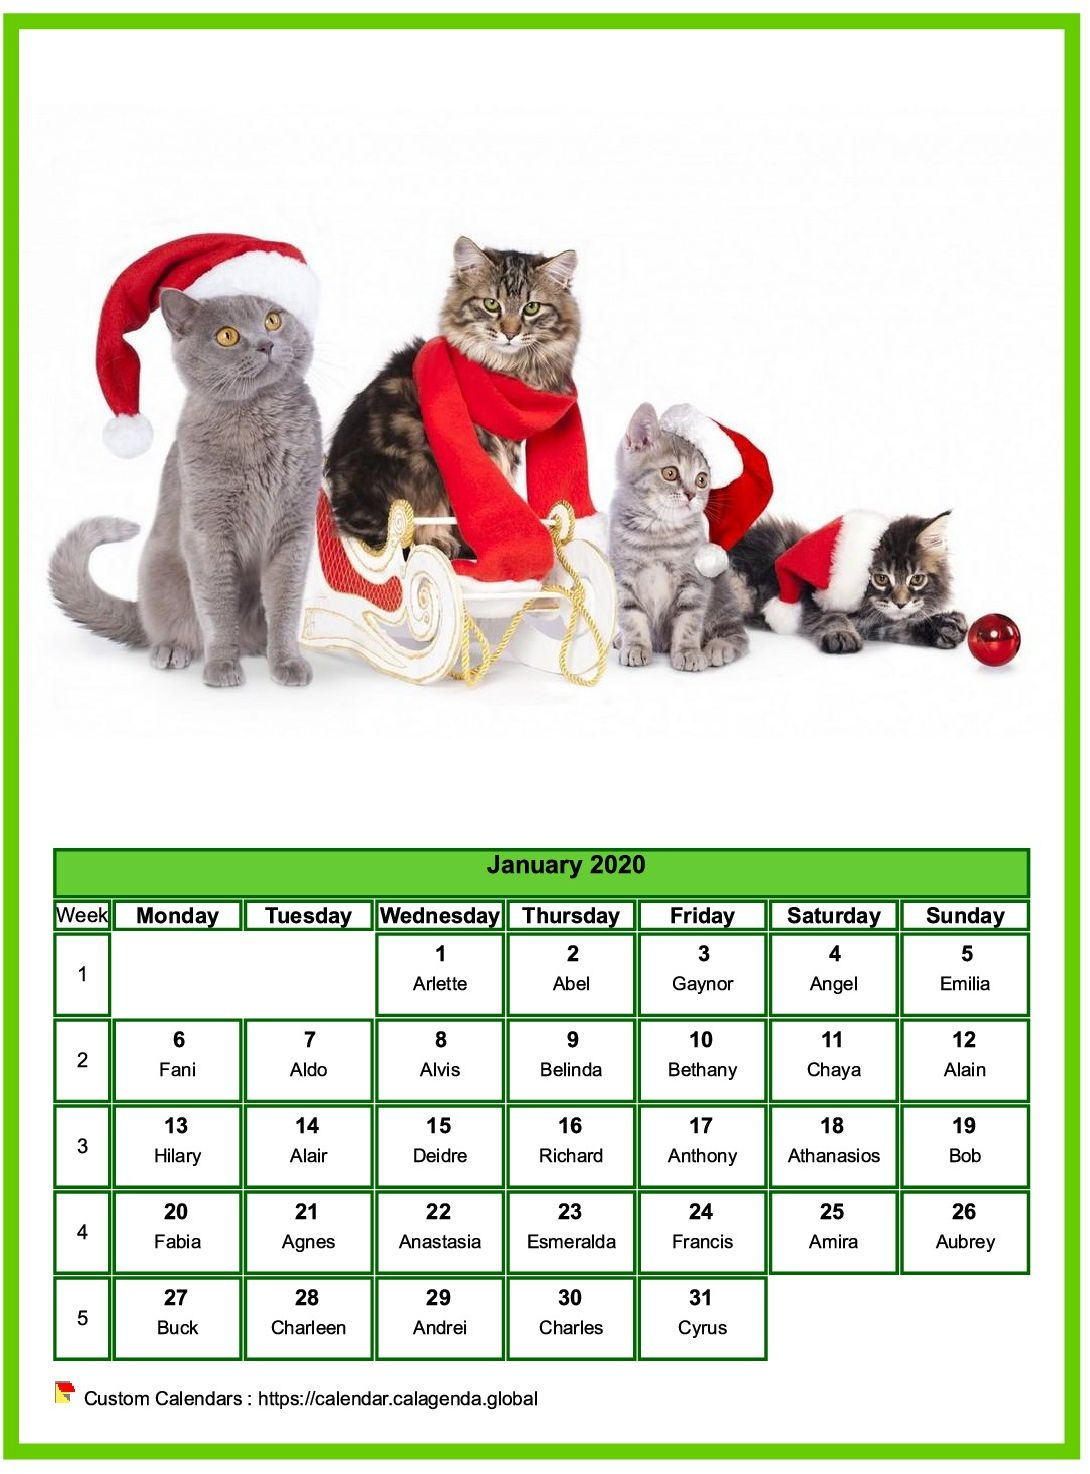 Calendar january 2020 cats